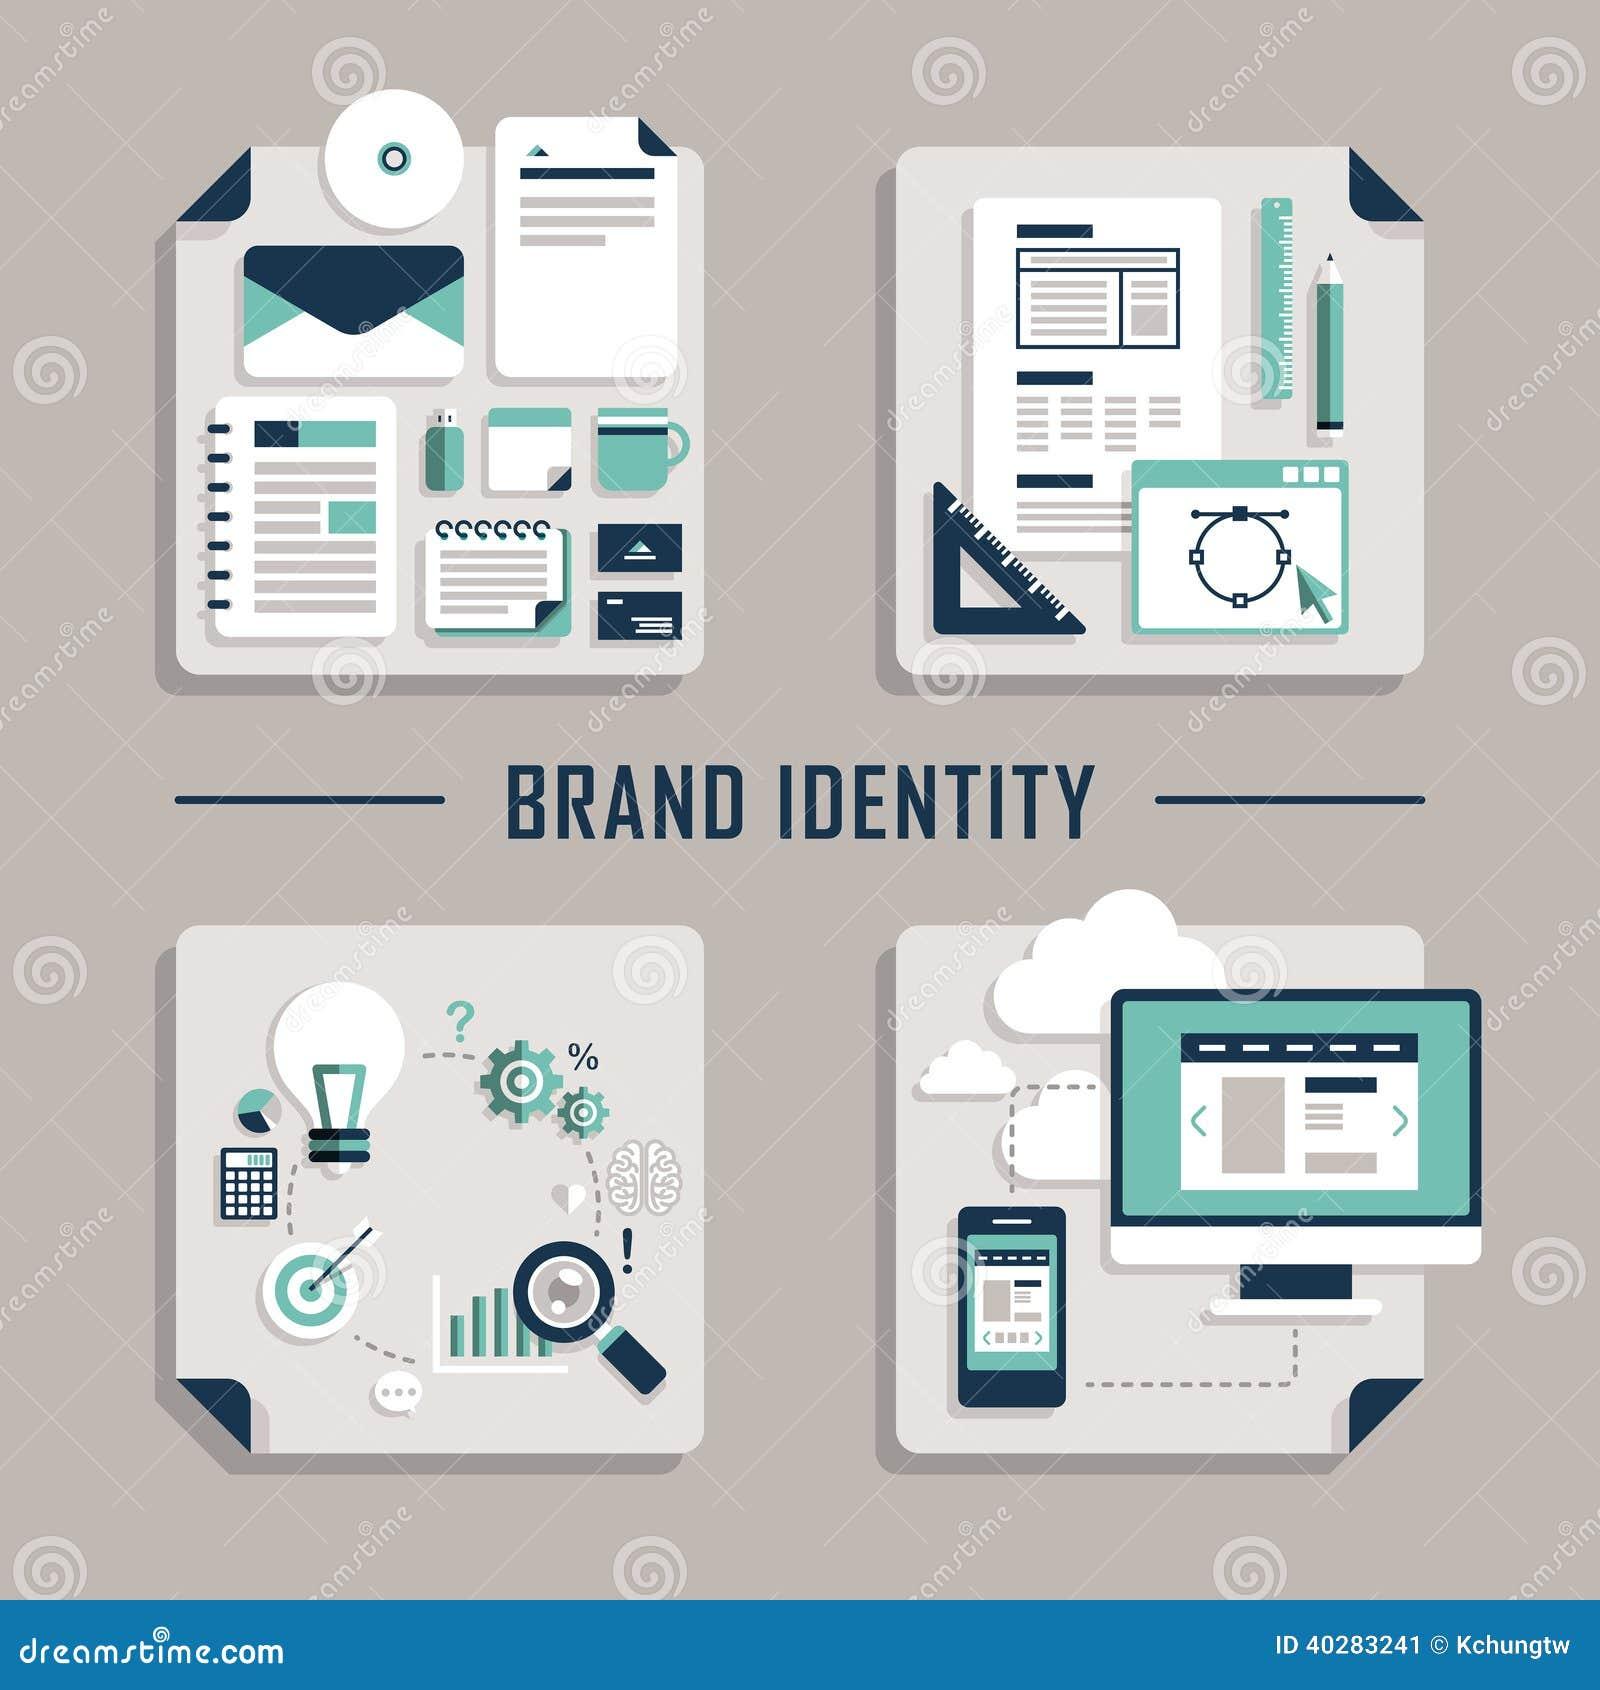 brand identity icon - photo #21